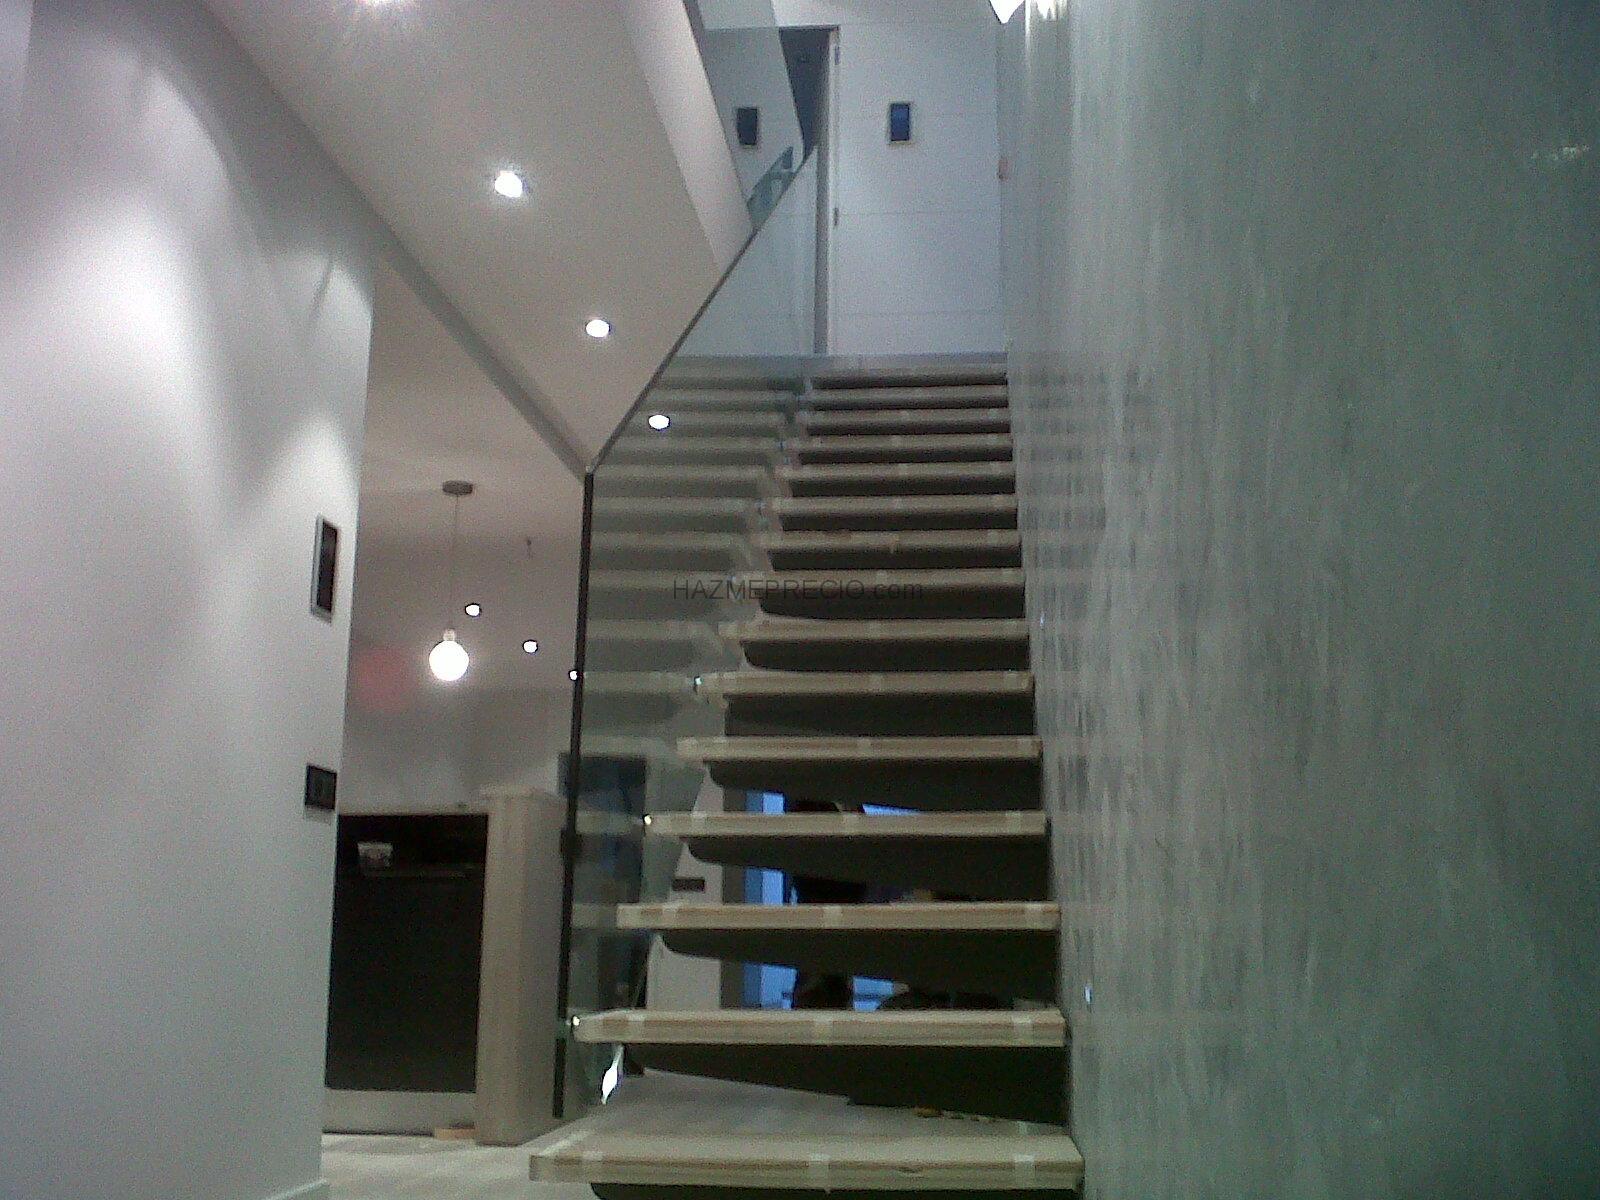 Presupuesto para baranda para escalera interior montgai for Escalera interior barata